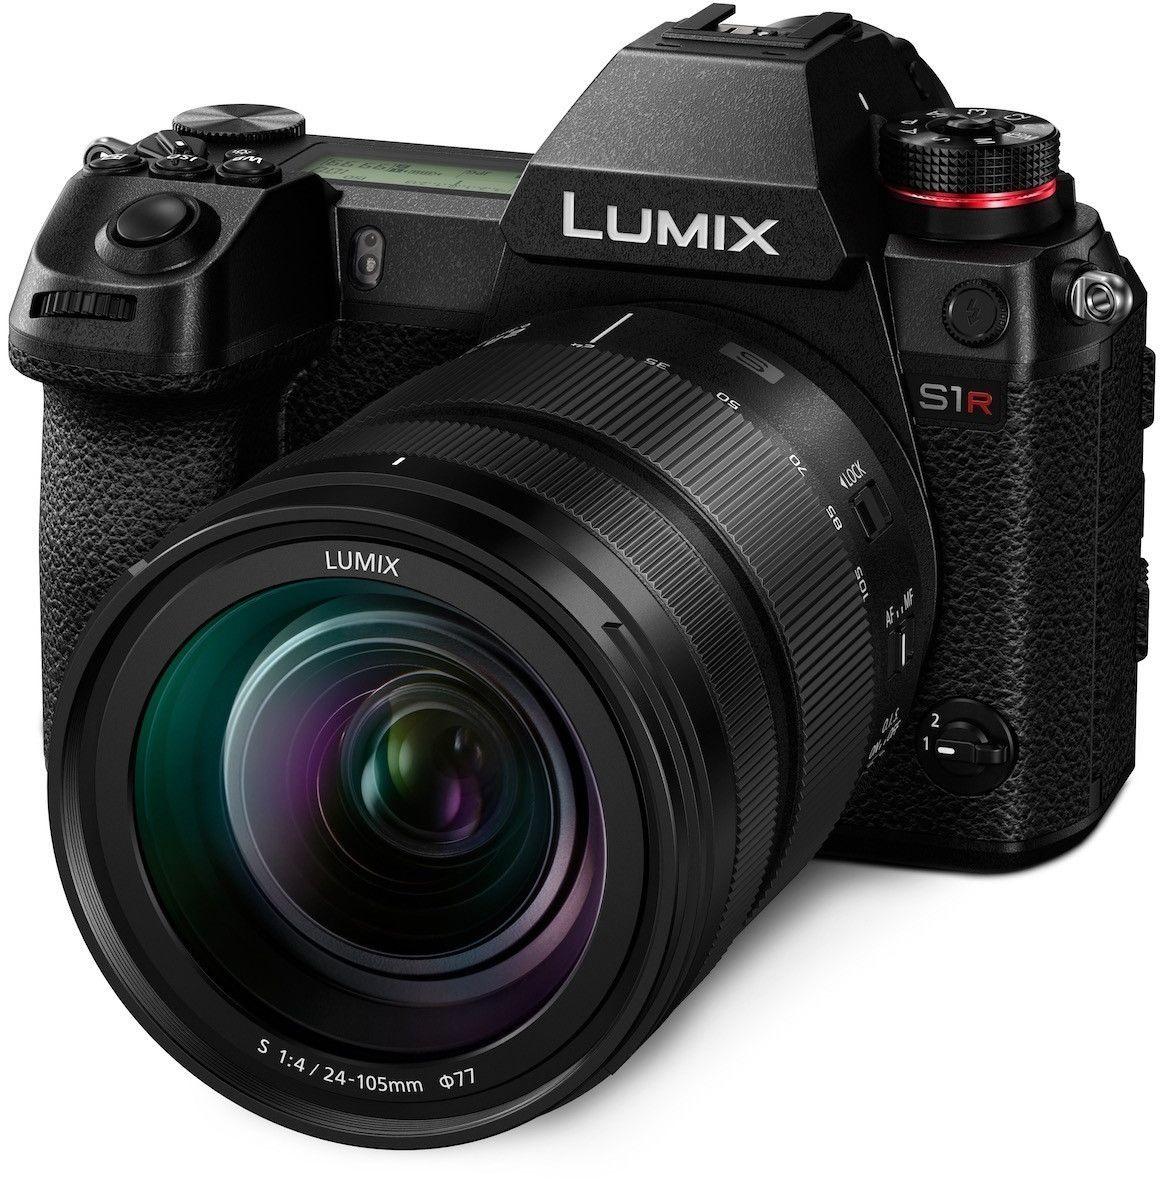 Panasonic Lumix S1R Systemkamera inkl. 24-105F4 Objektiv | Miss Numerique FR